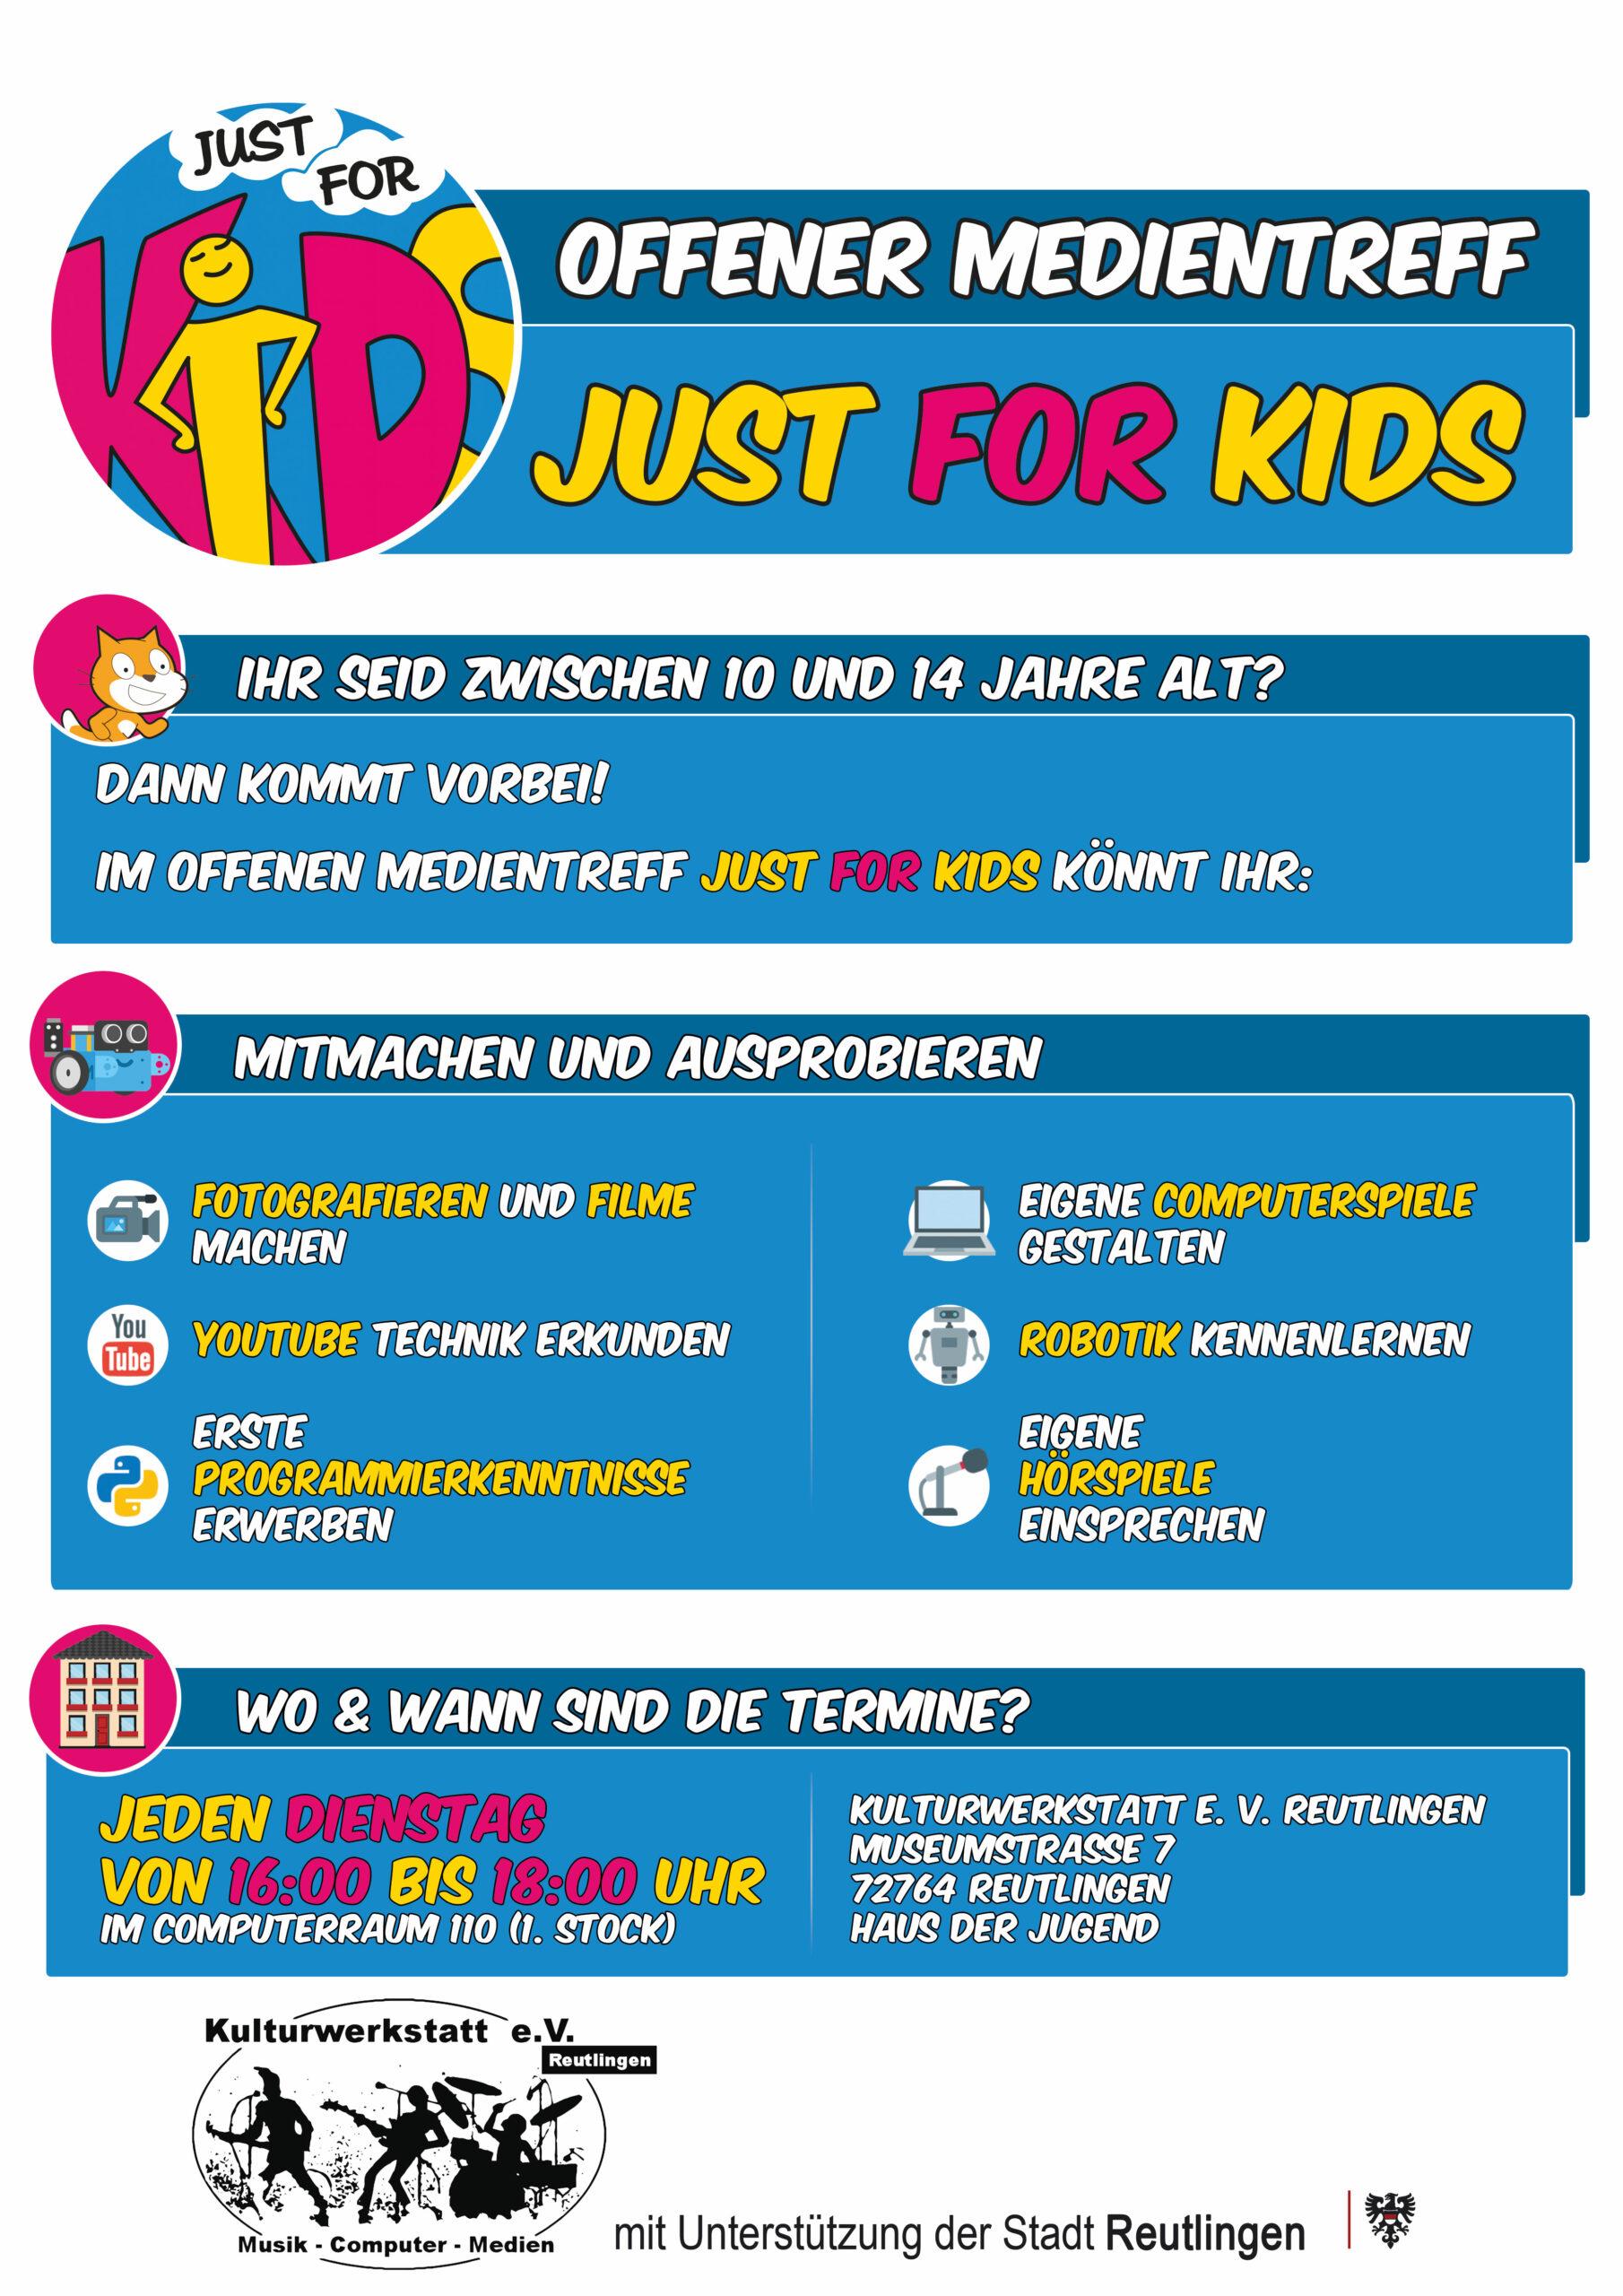 Offener Medientreff: just for kids